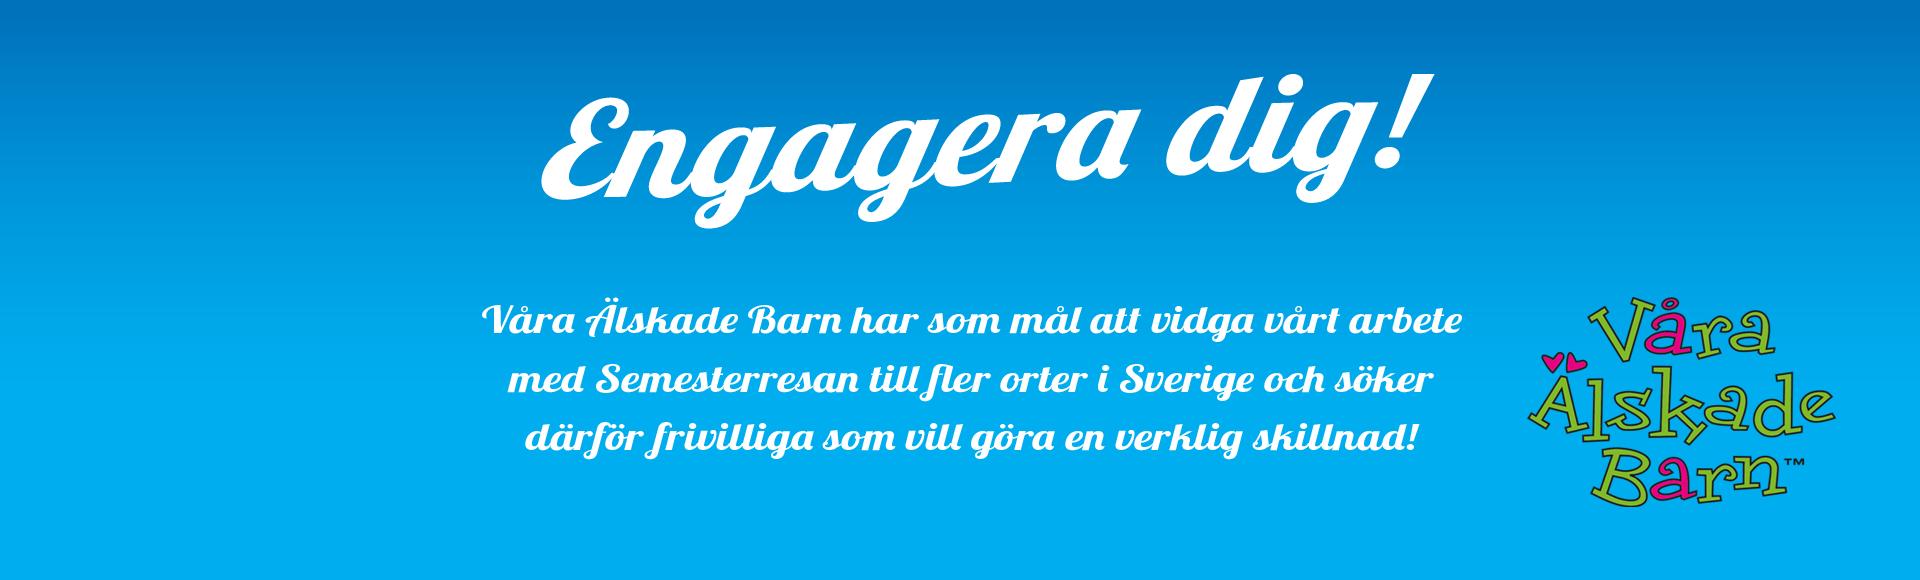 Till-HemsidaEngagera-Dig.png